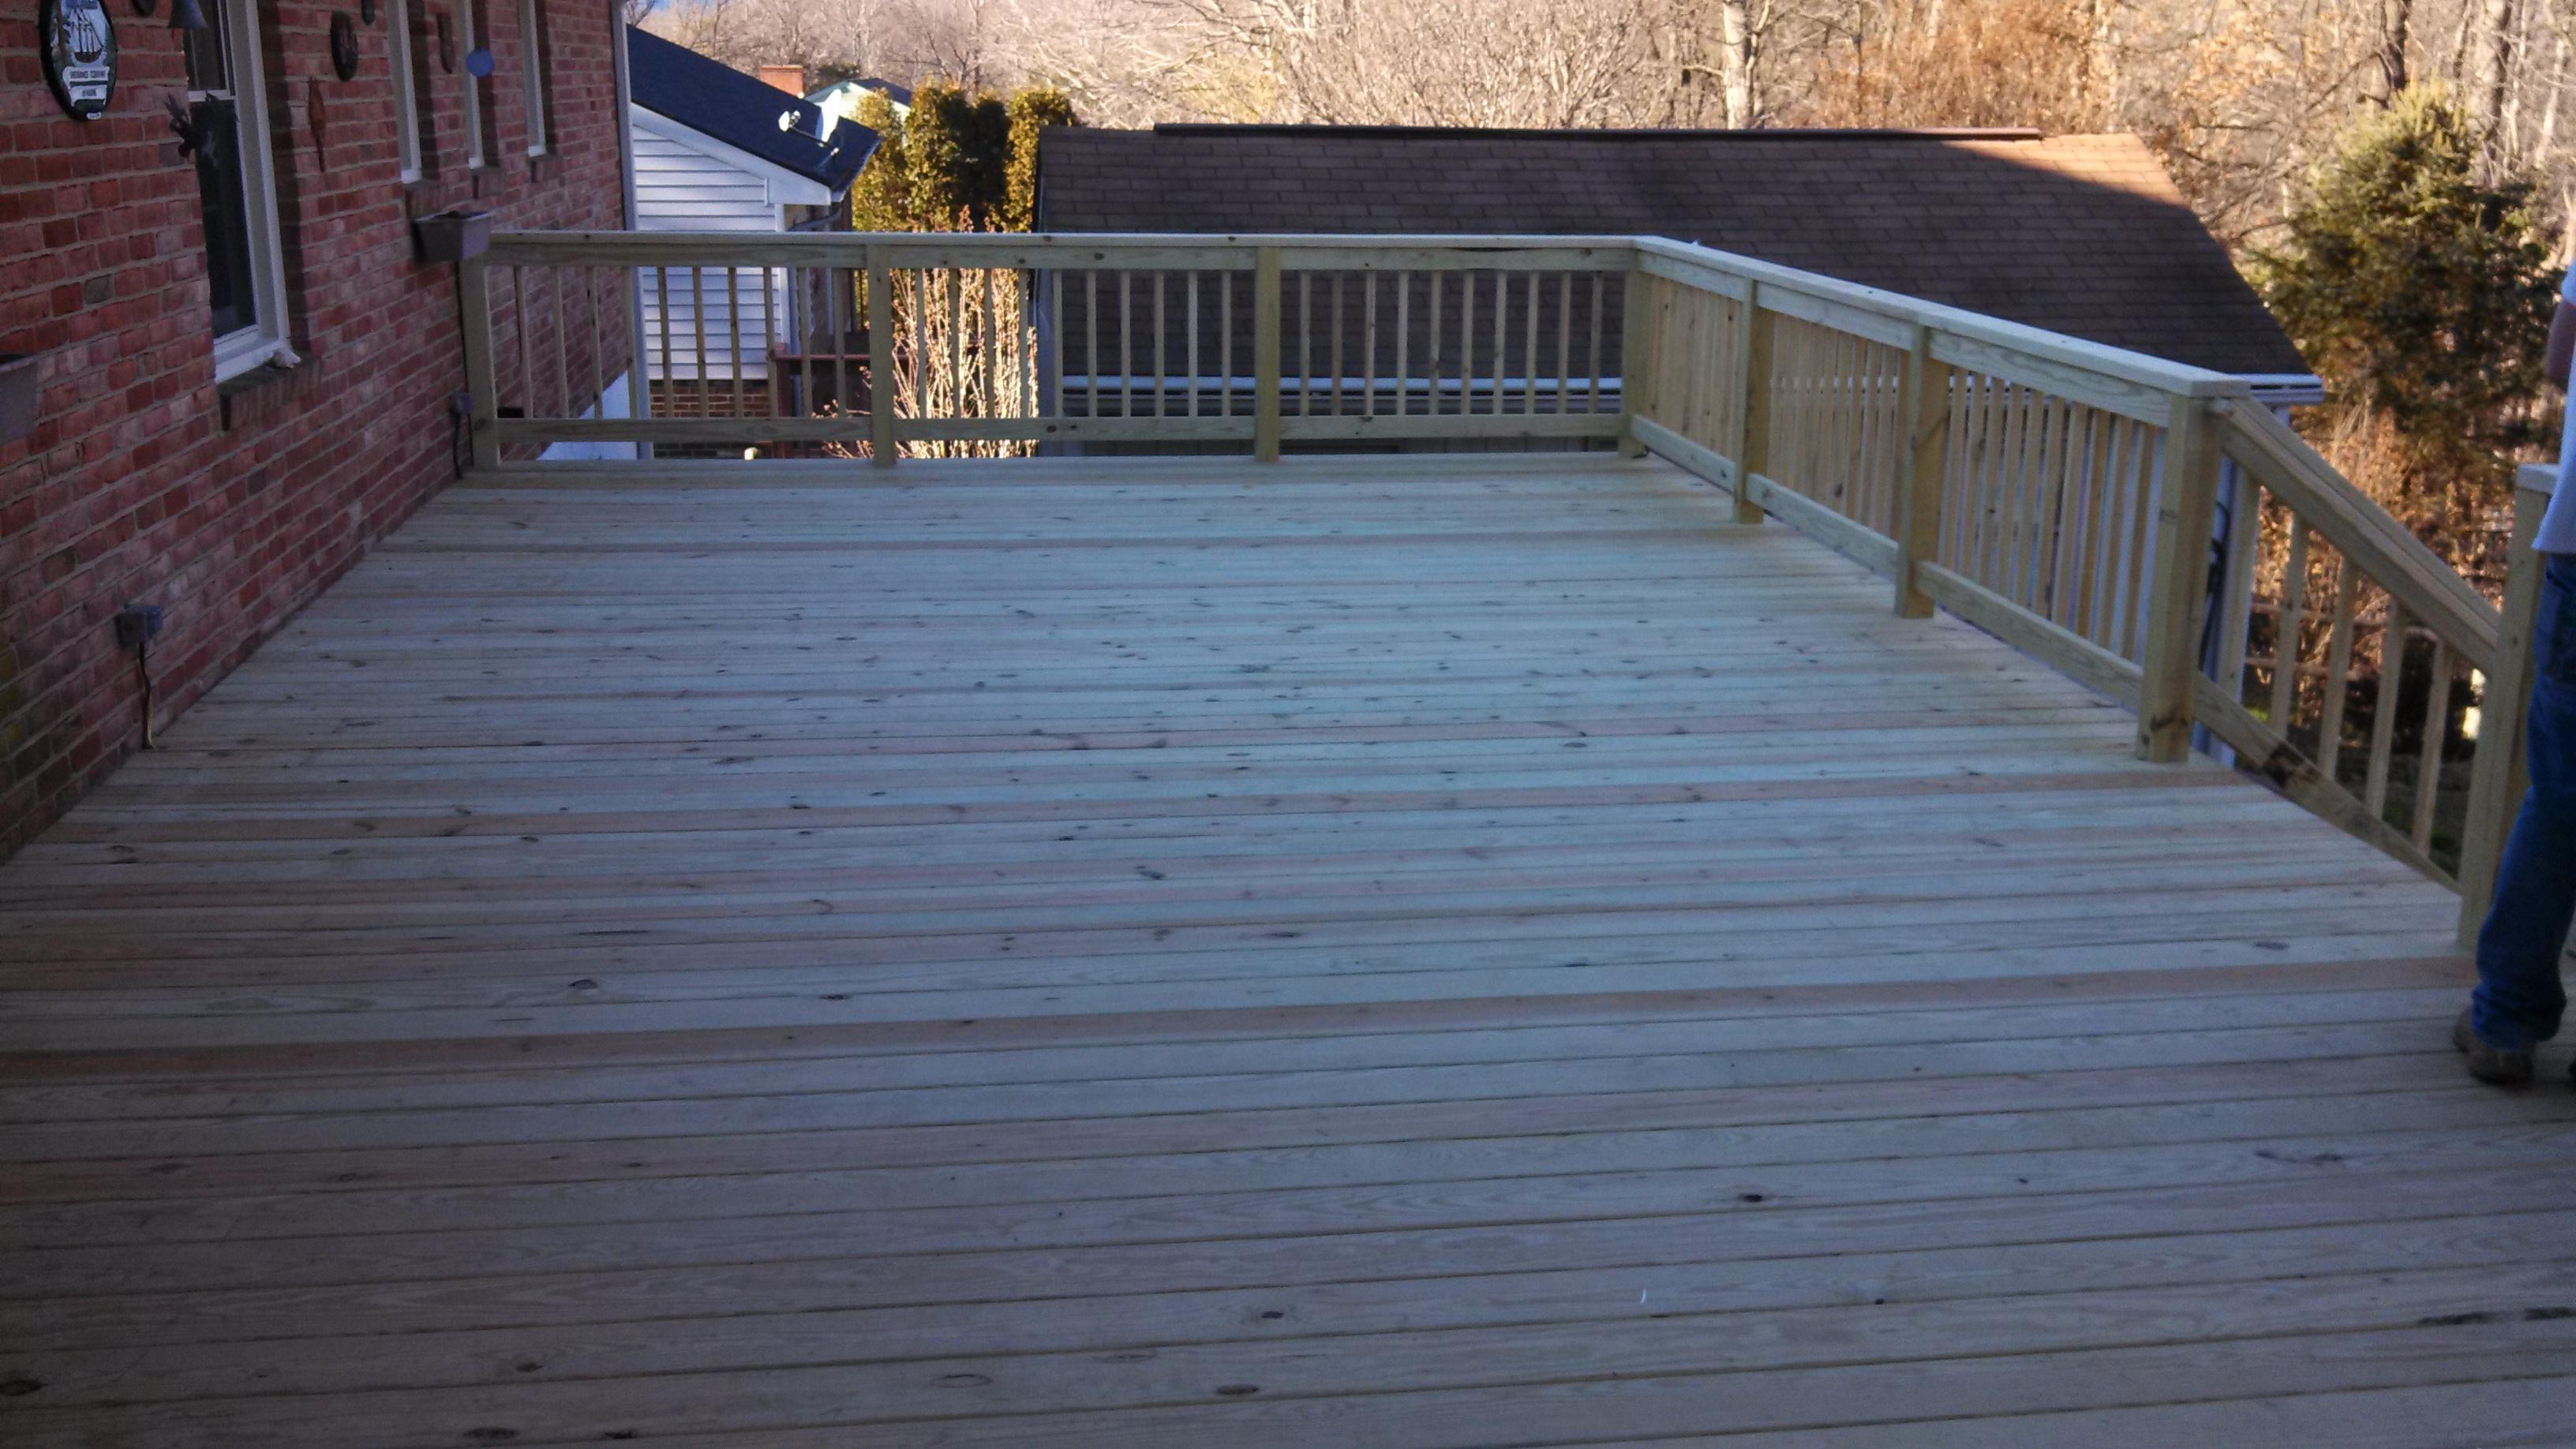 16x24 deck